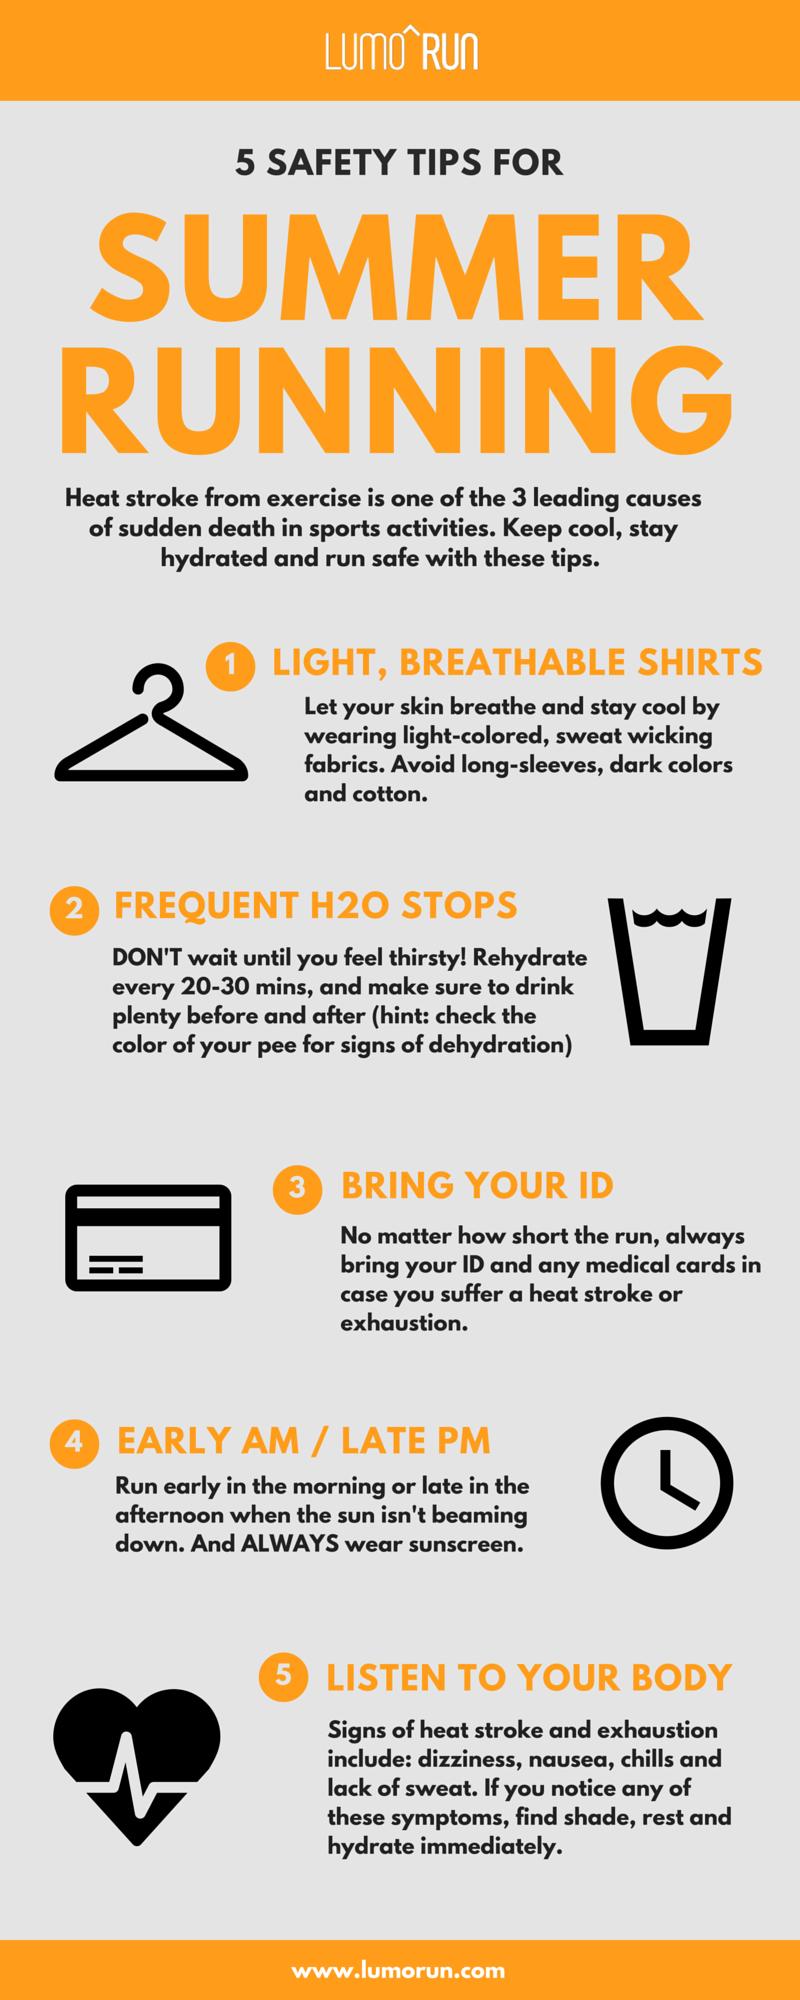 safety tips for summer running